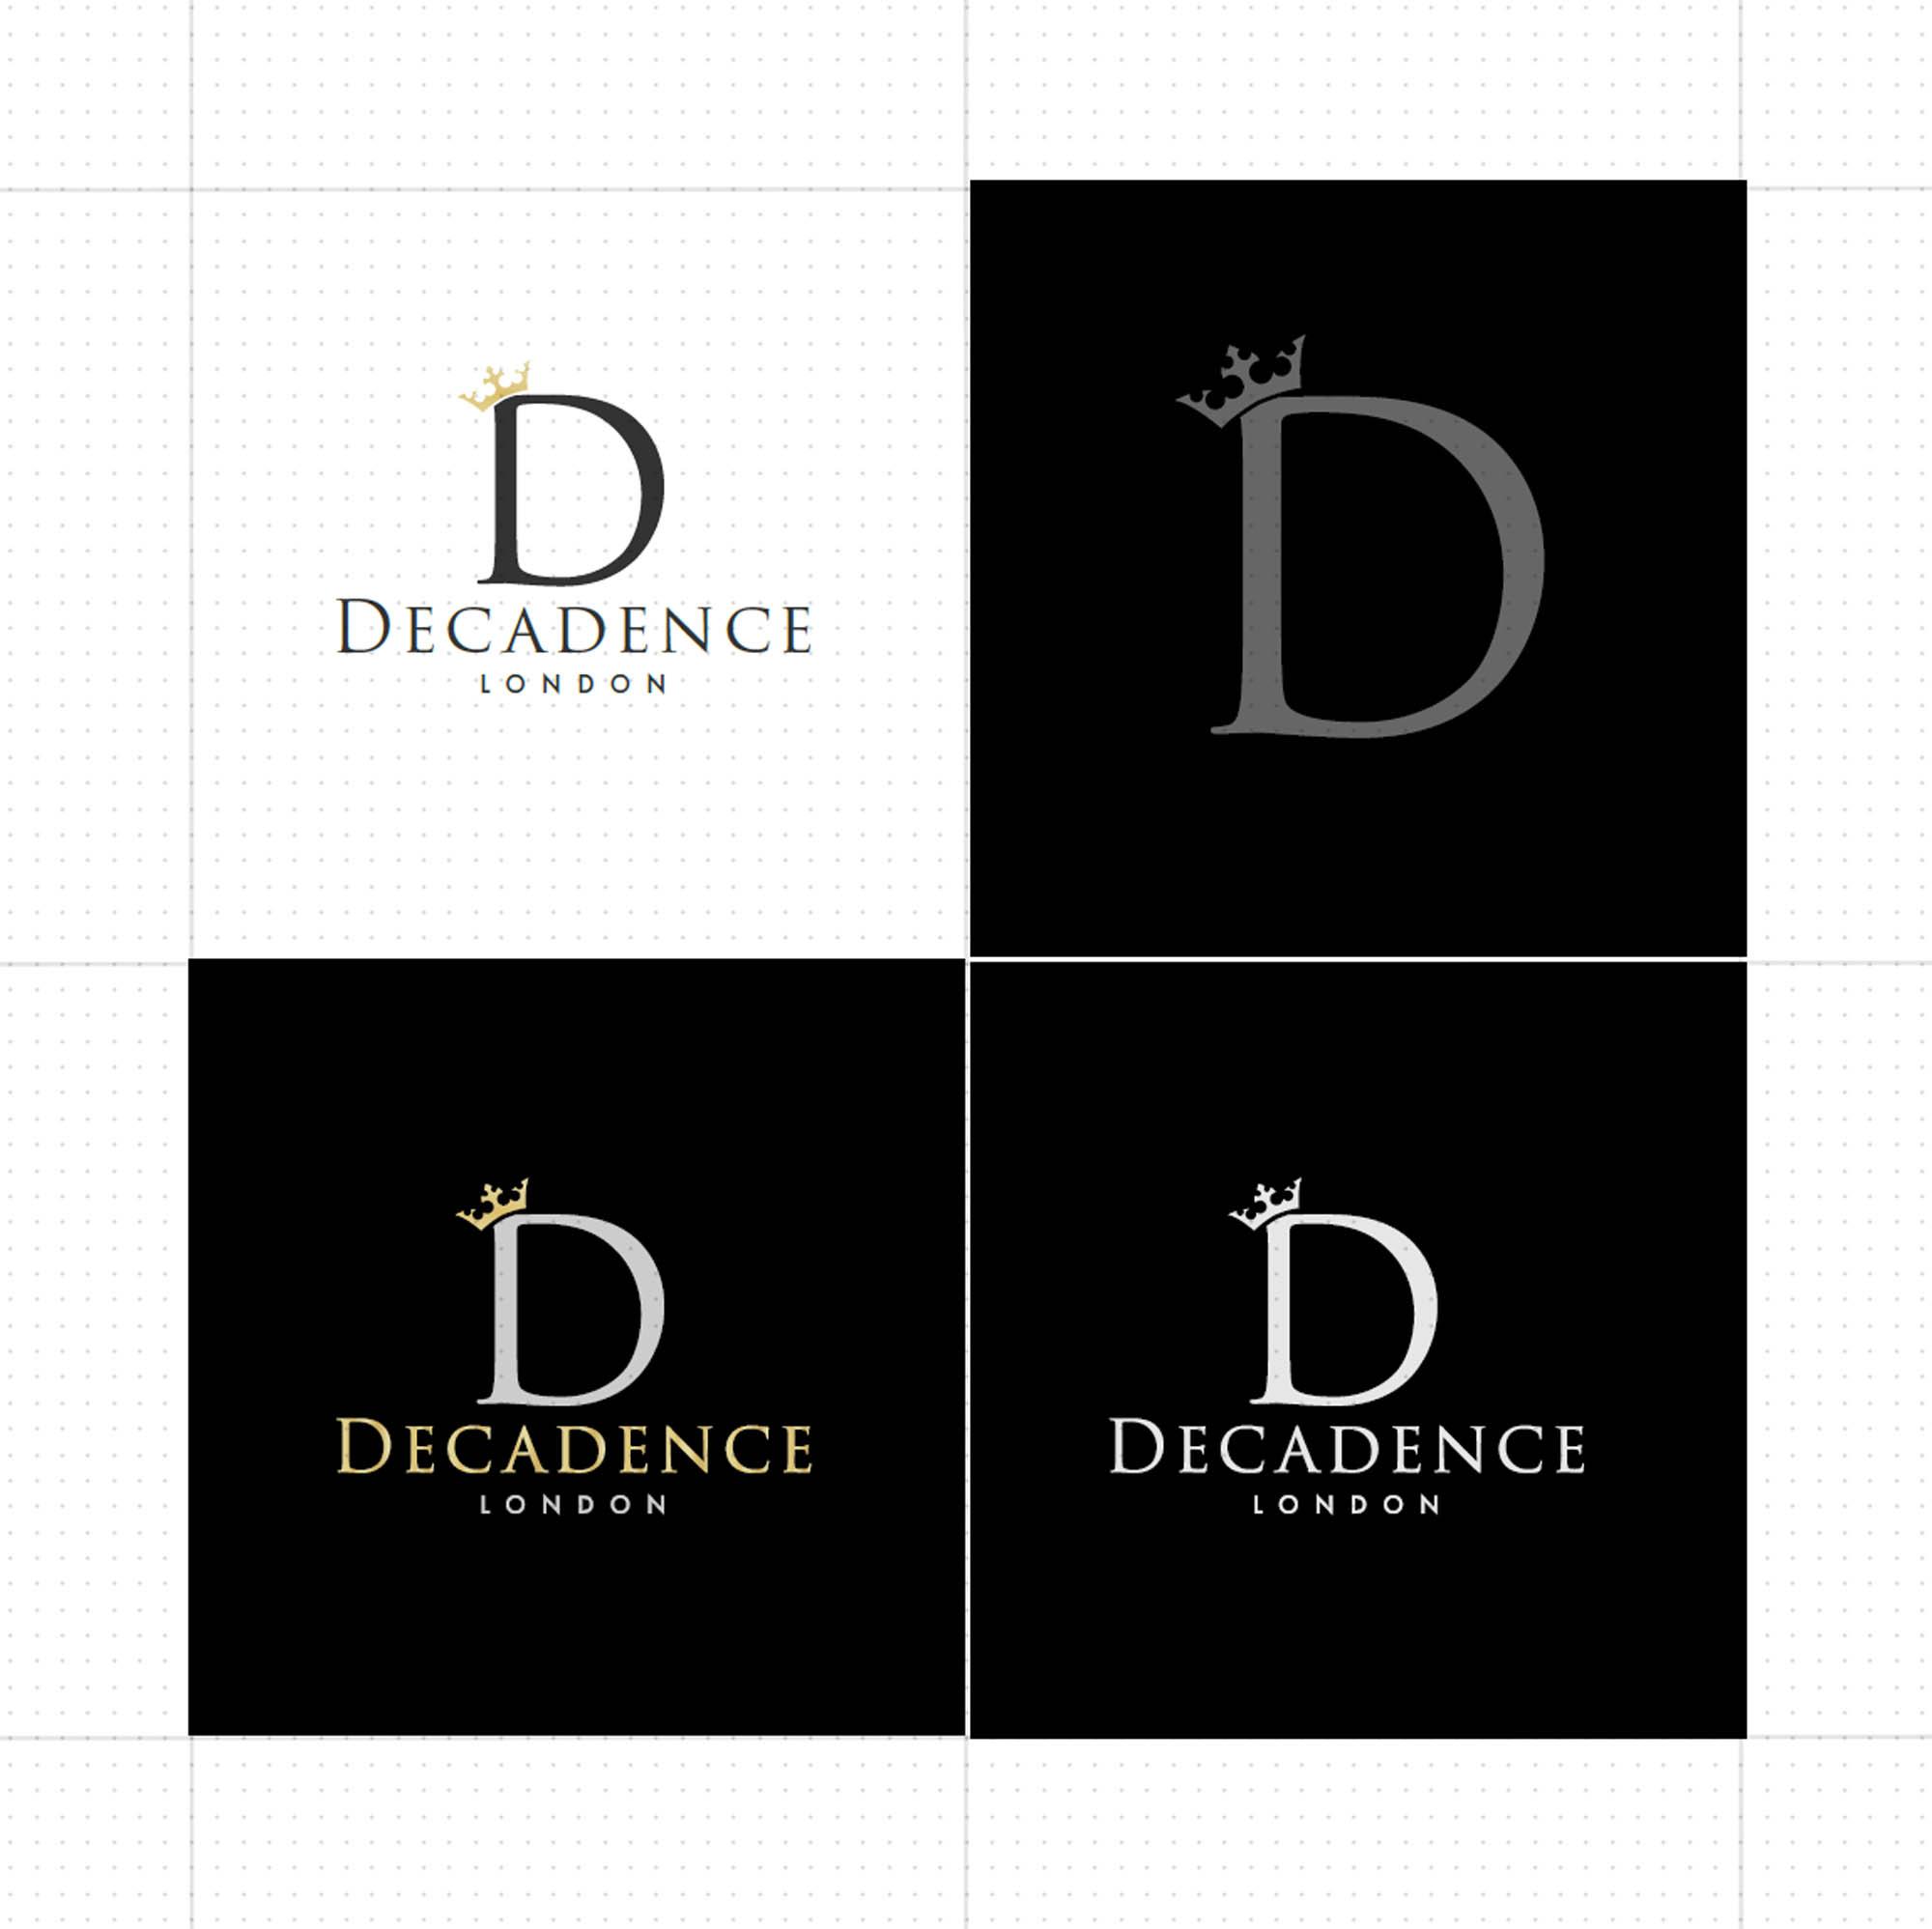 luxury-high-end-clothing-brand-logo-design-london07